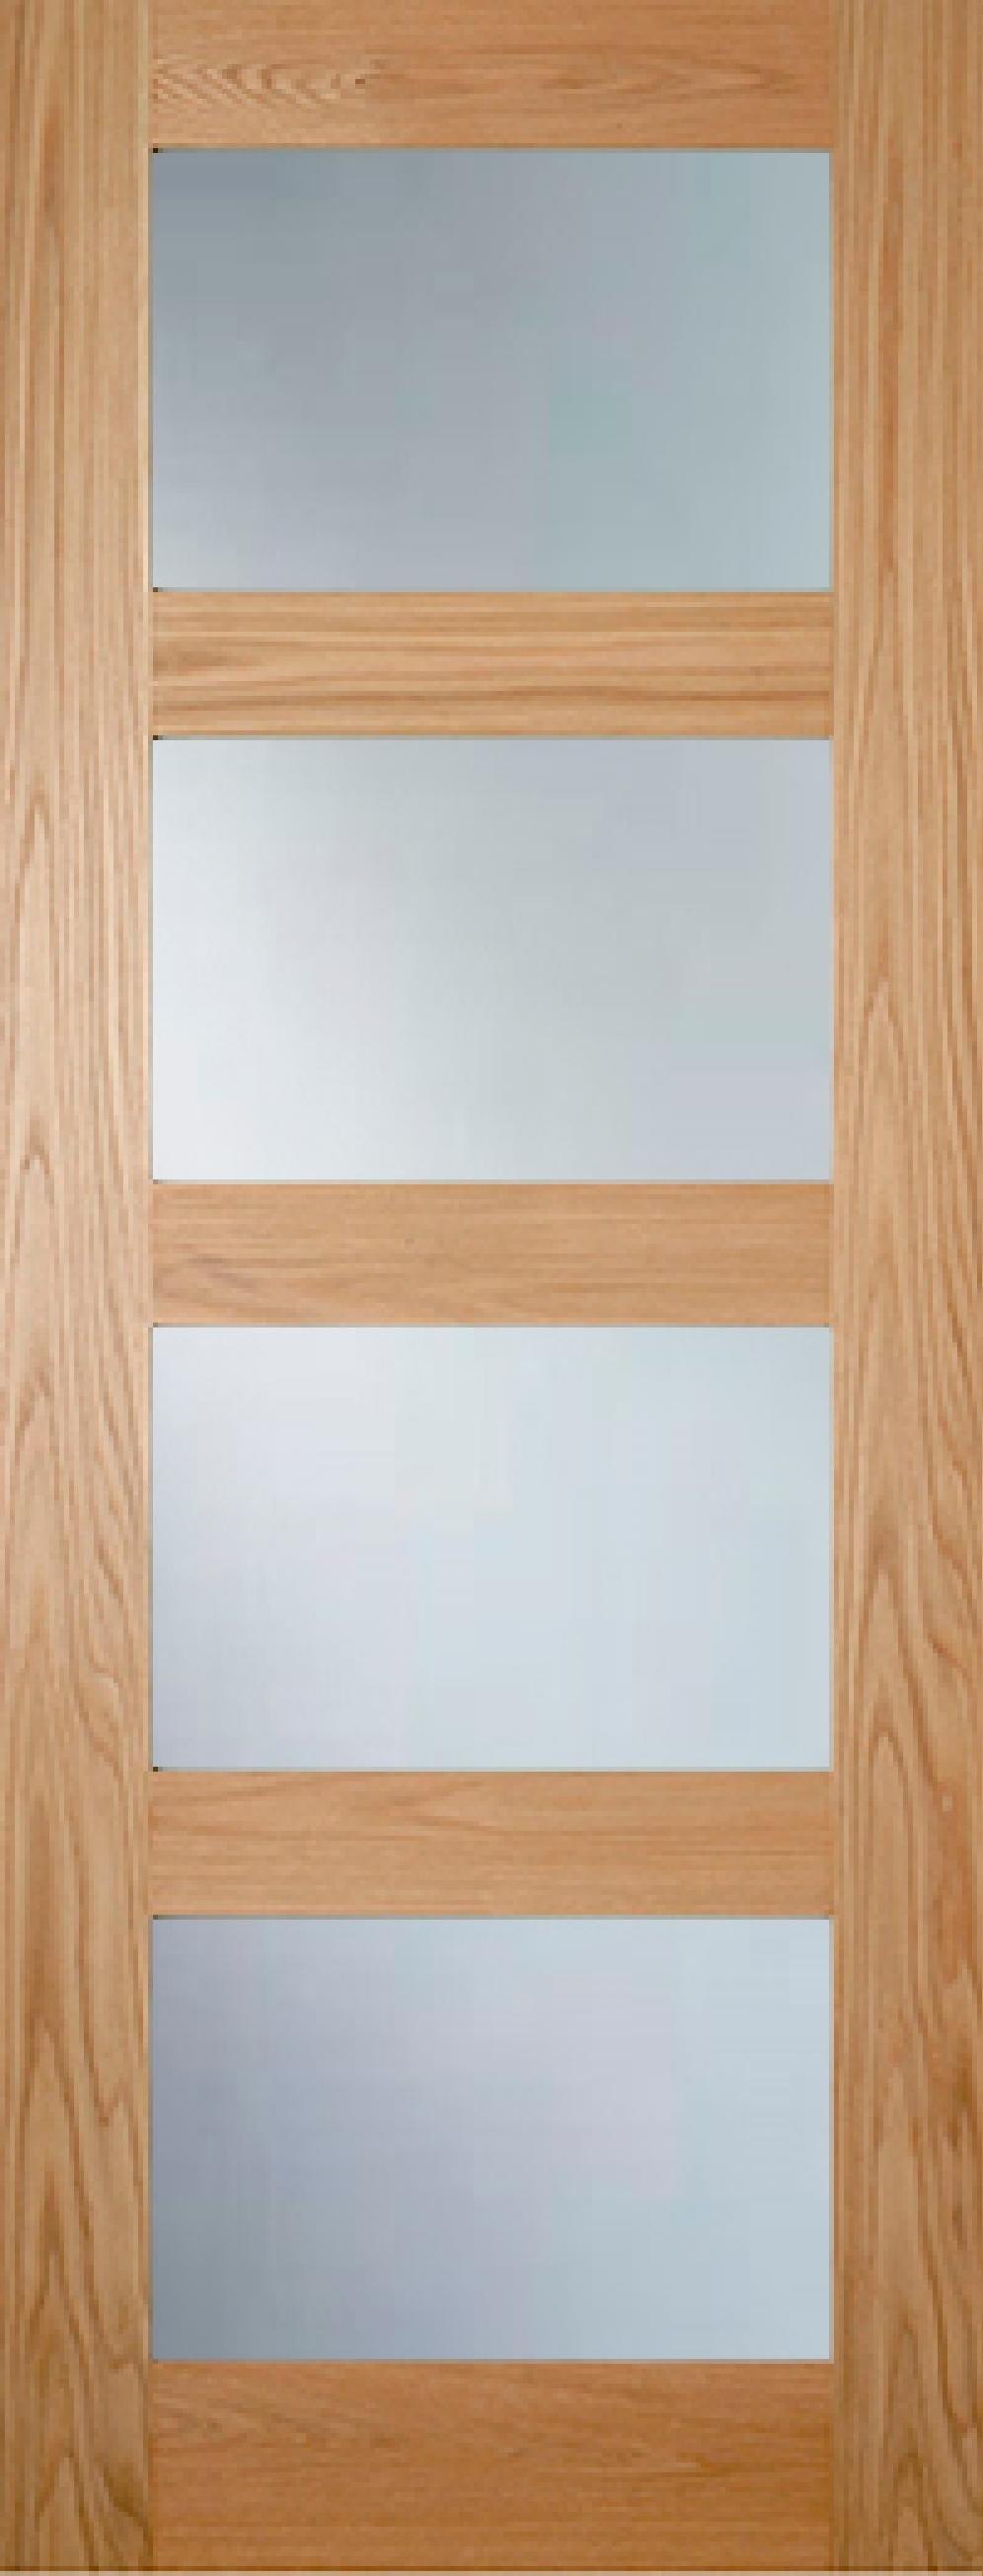 Coventry Glazed Oak Shaker - Clear Image